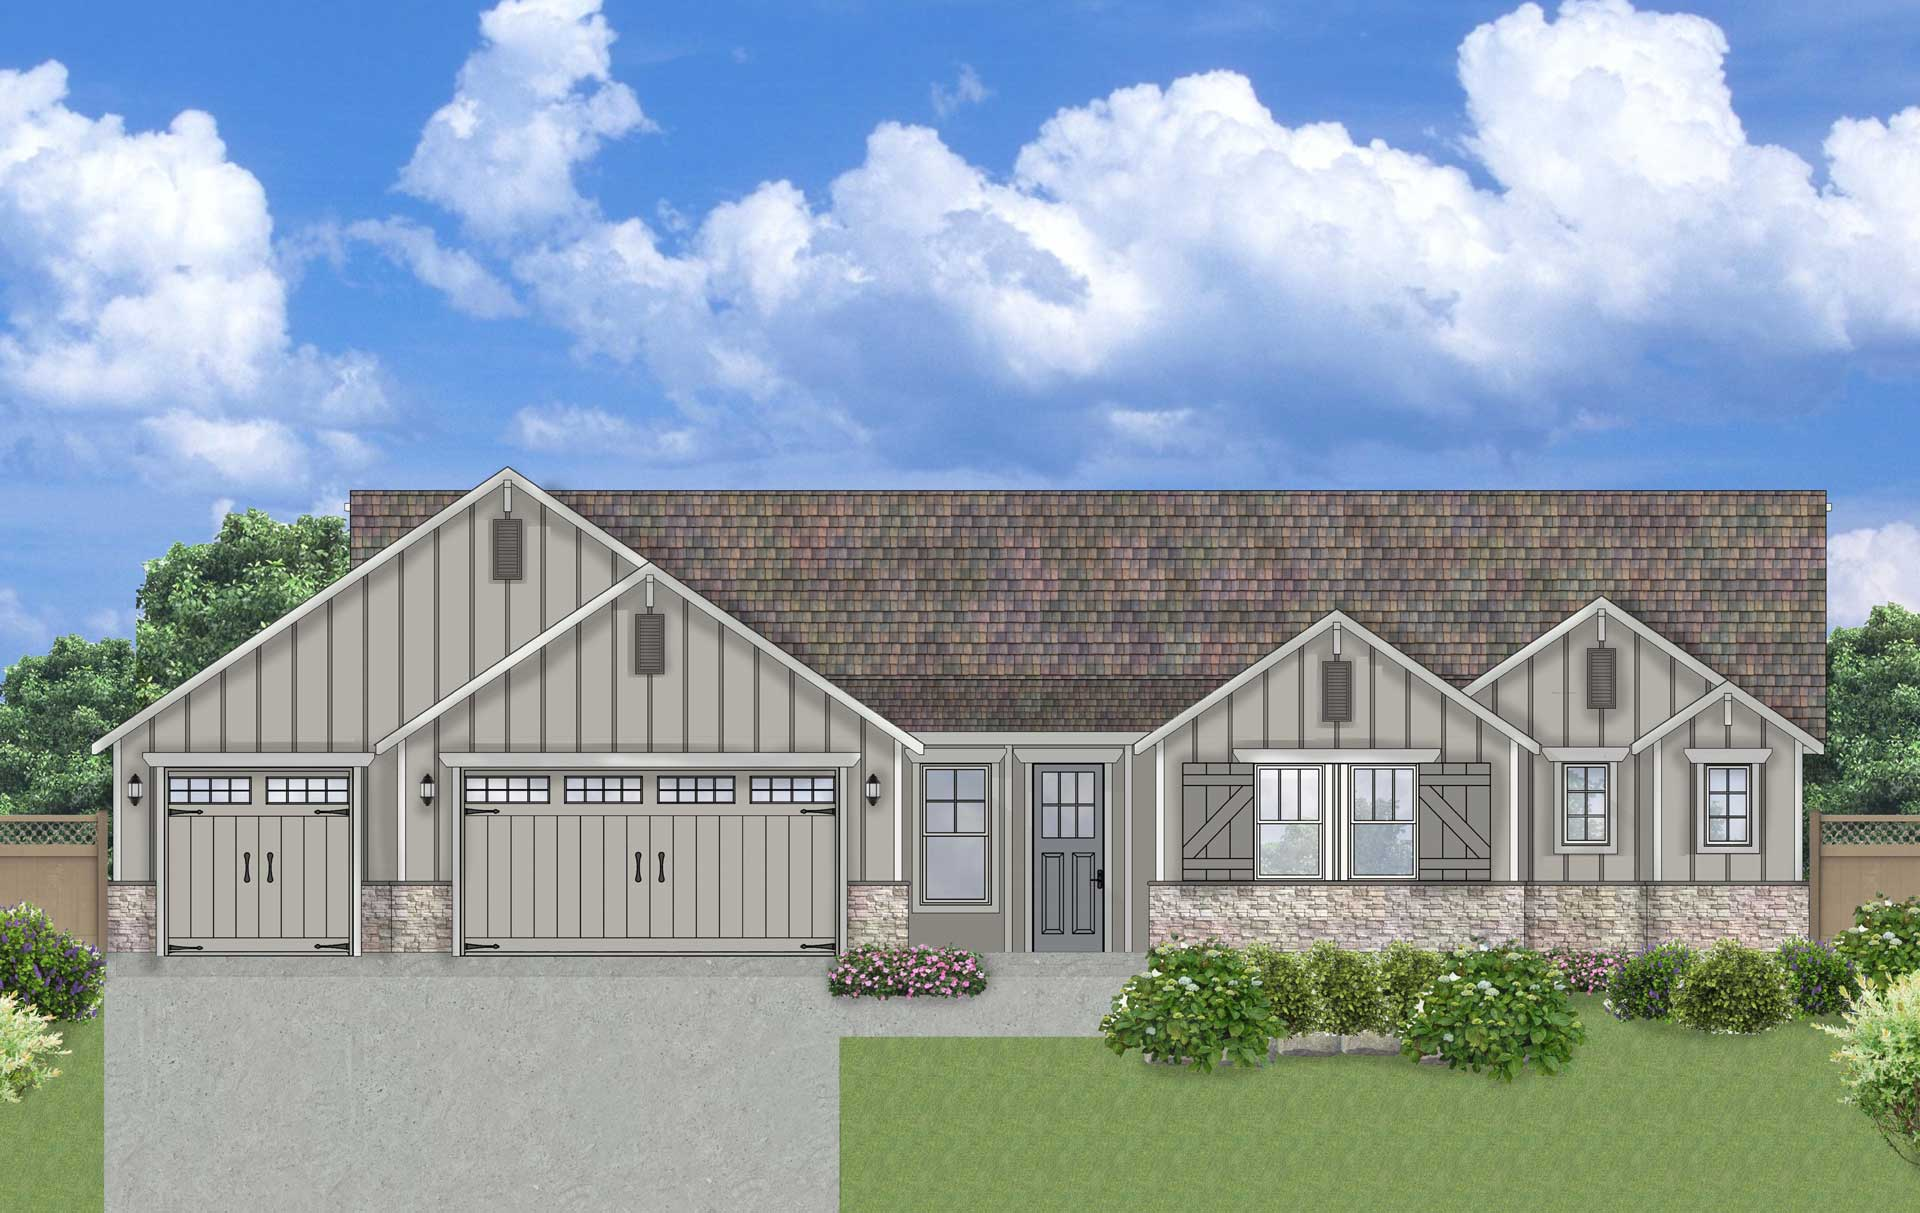 Dressler Flats - Santa Ynez Valley Construction